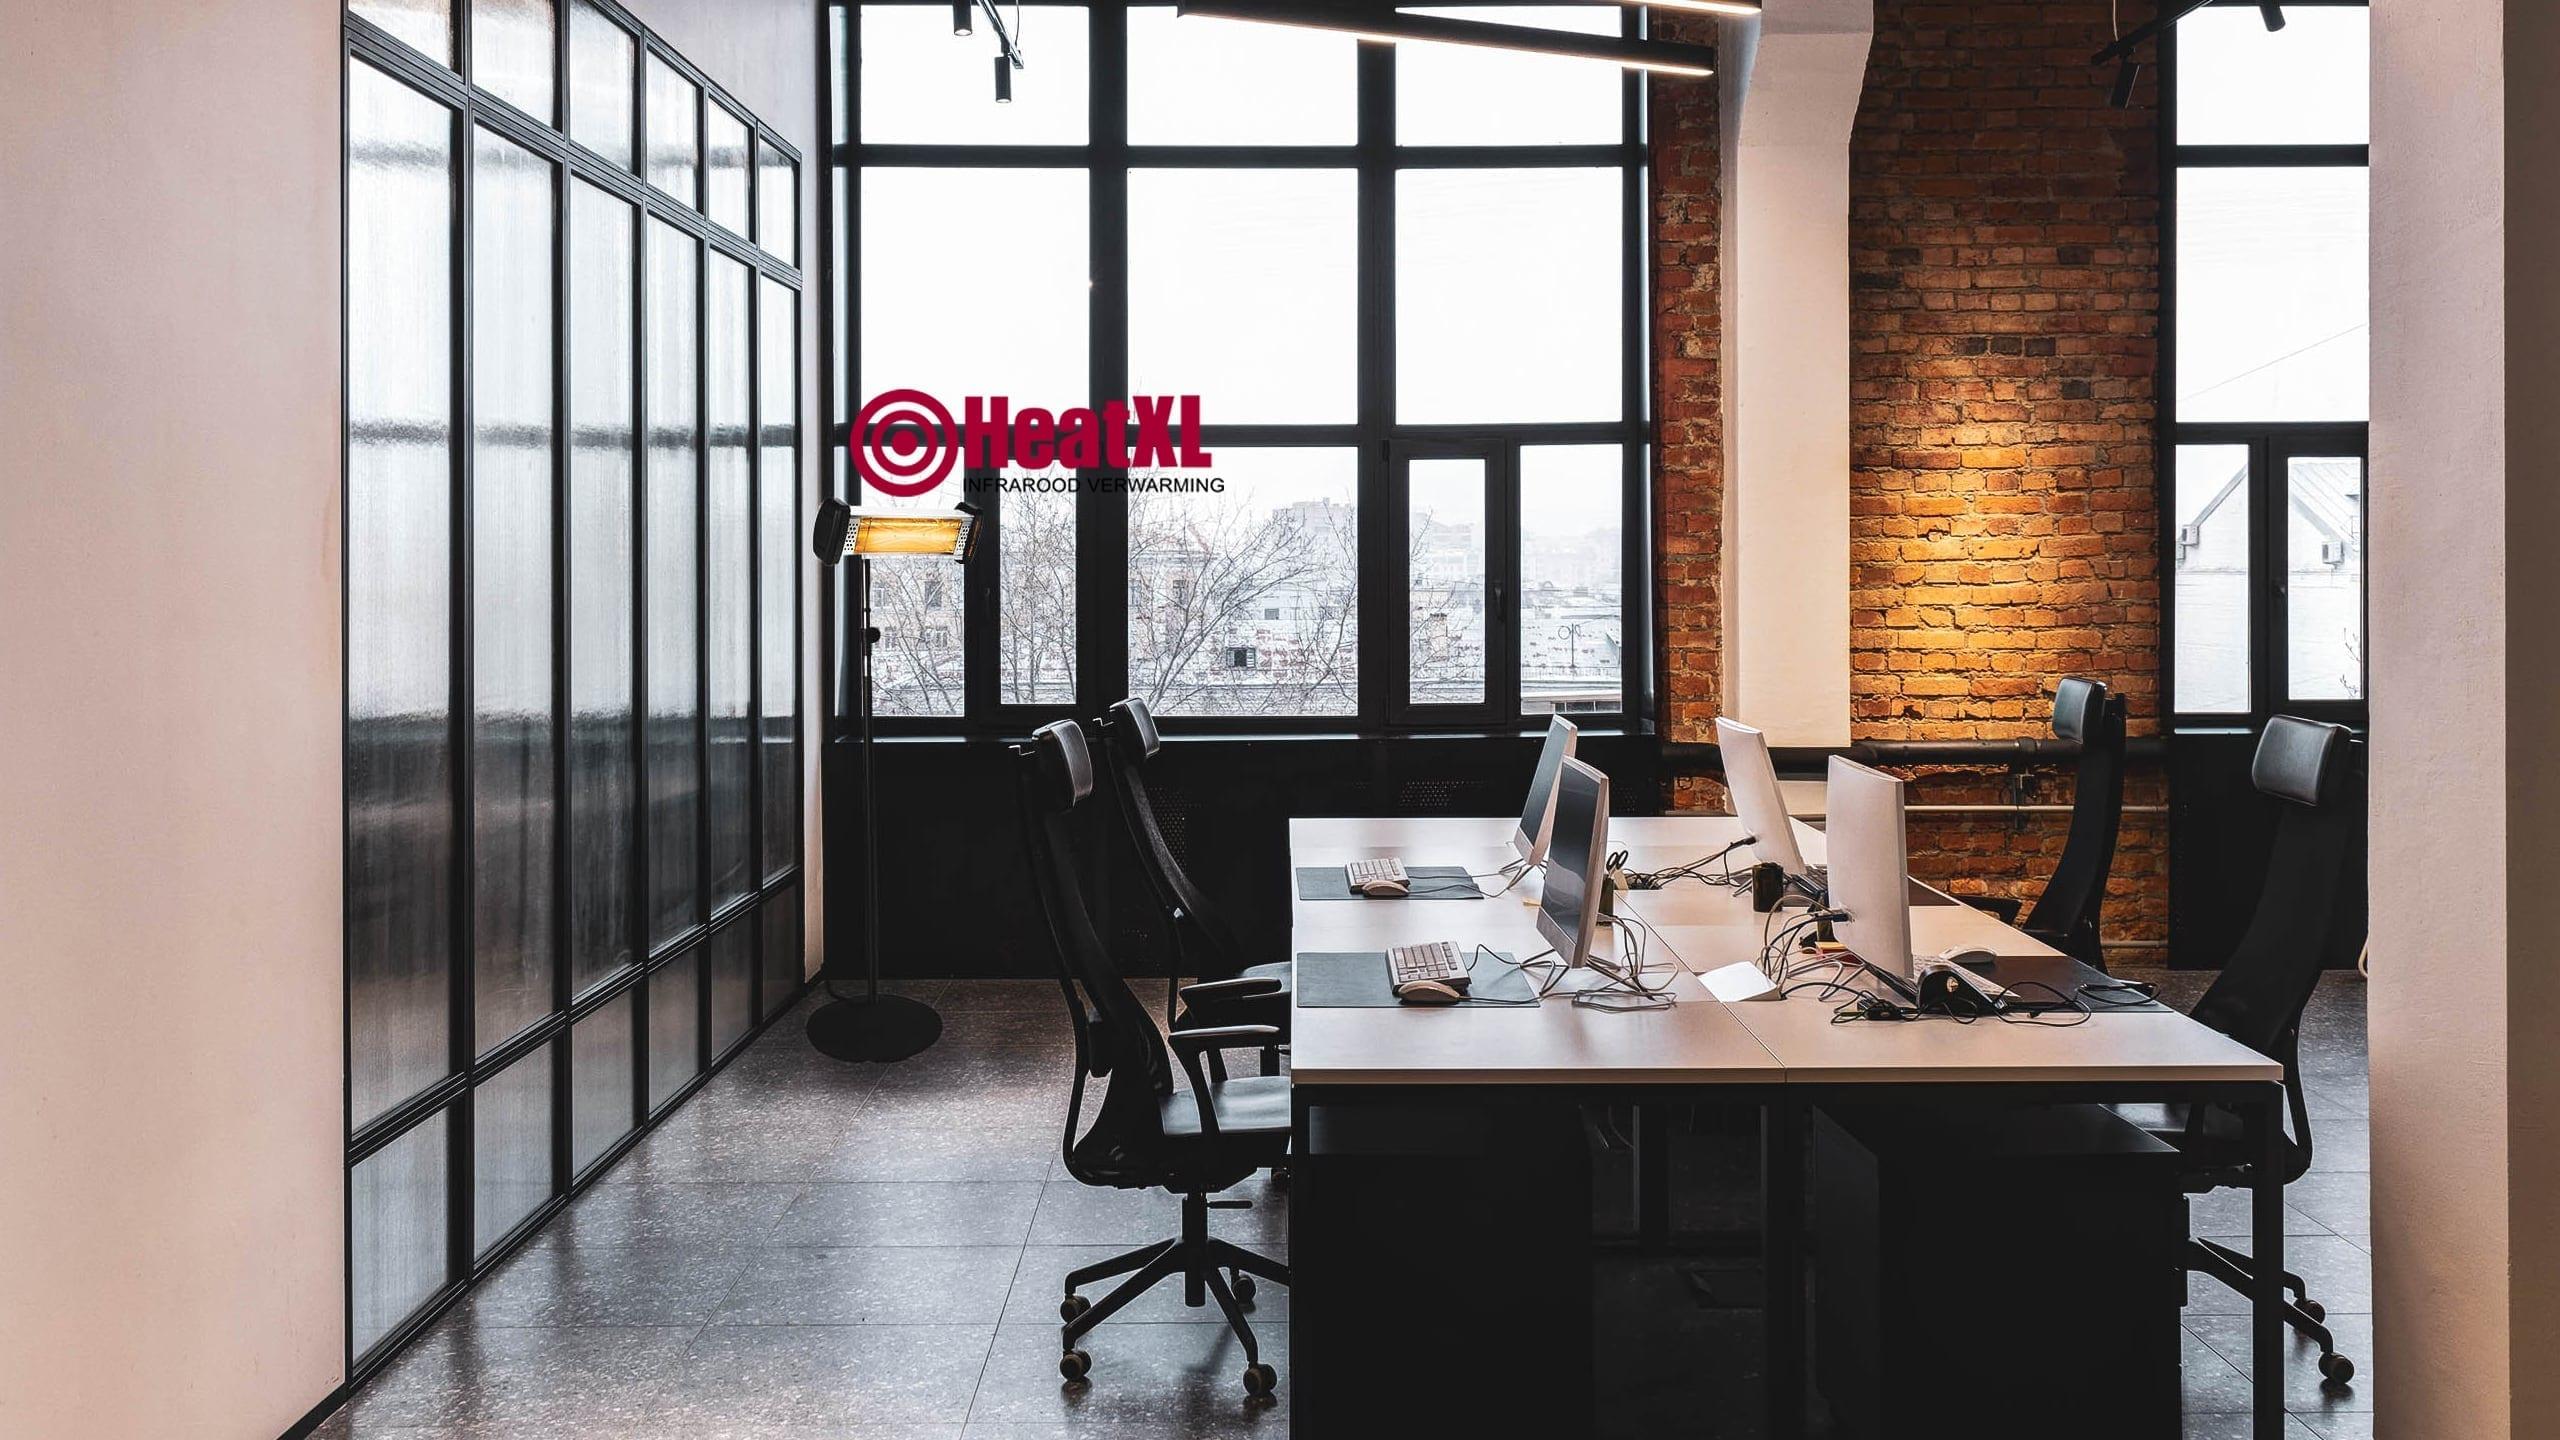 Mobiele kachel kantoor en thuis df